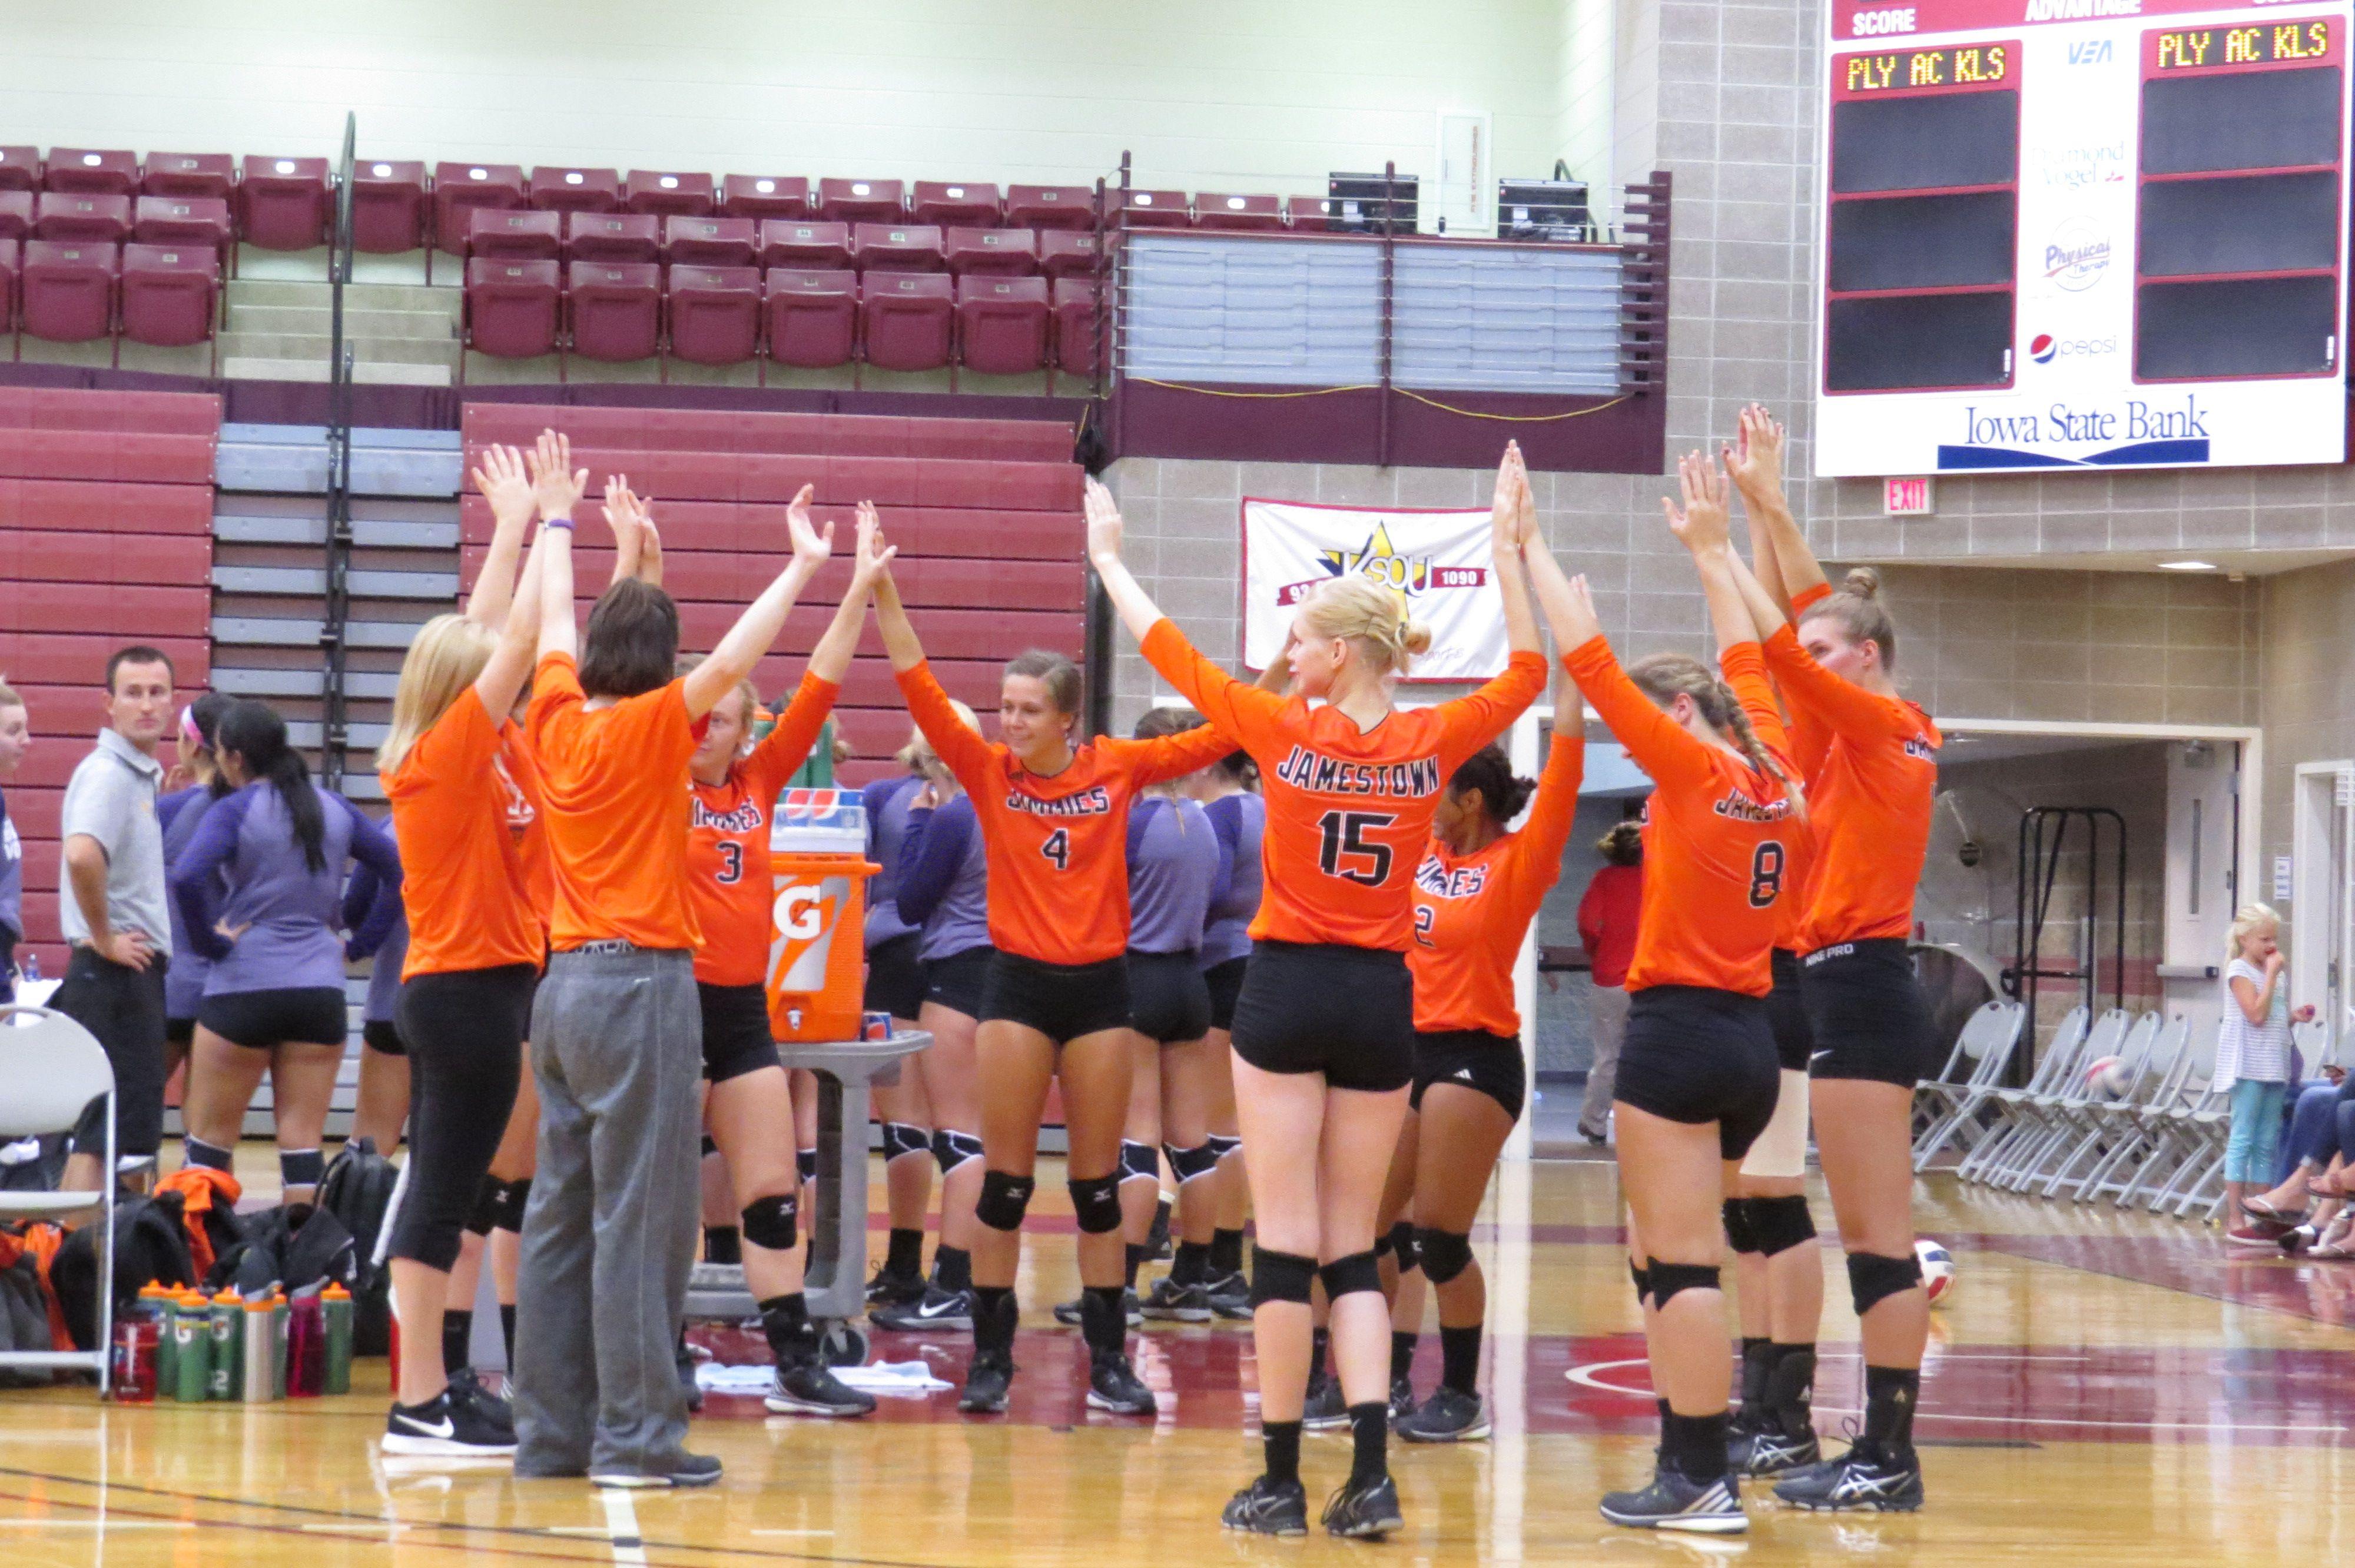 University Of Jamestown Jimmie Volleyball At Nwc College Orange City Iowa Gym Orange City Iowa Orange City Iowa